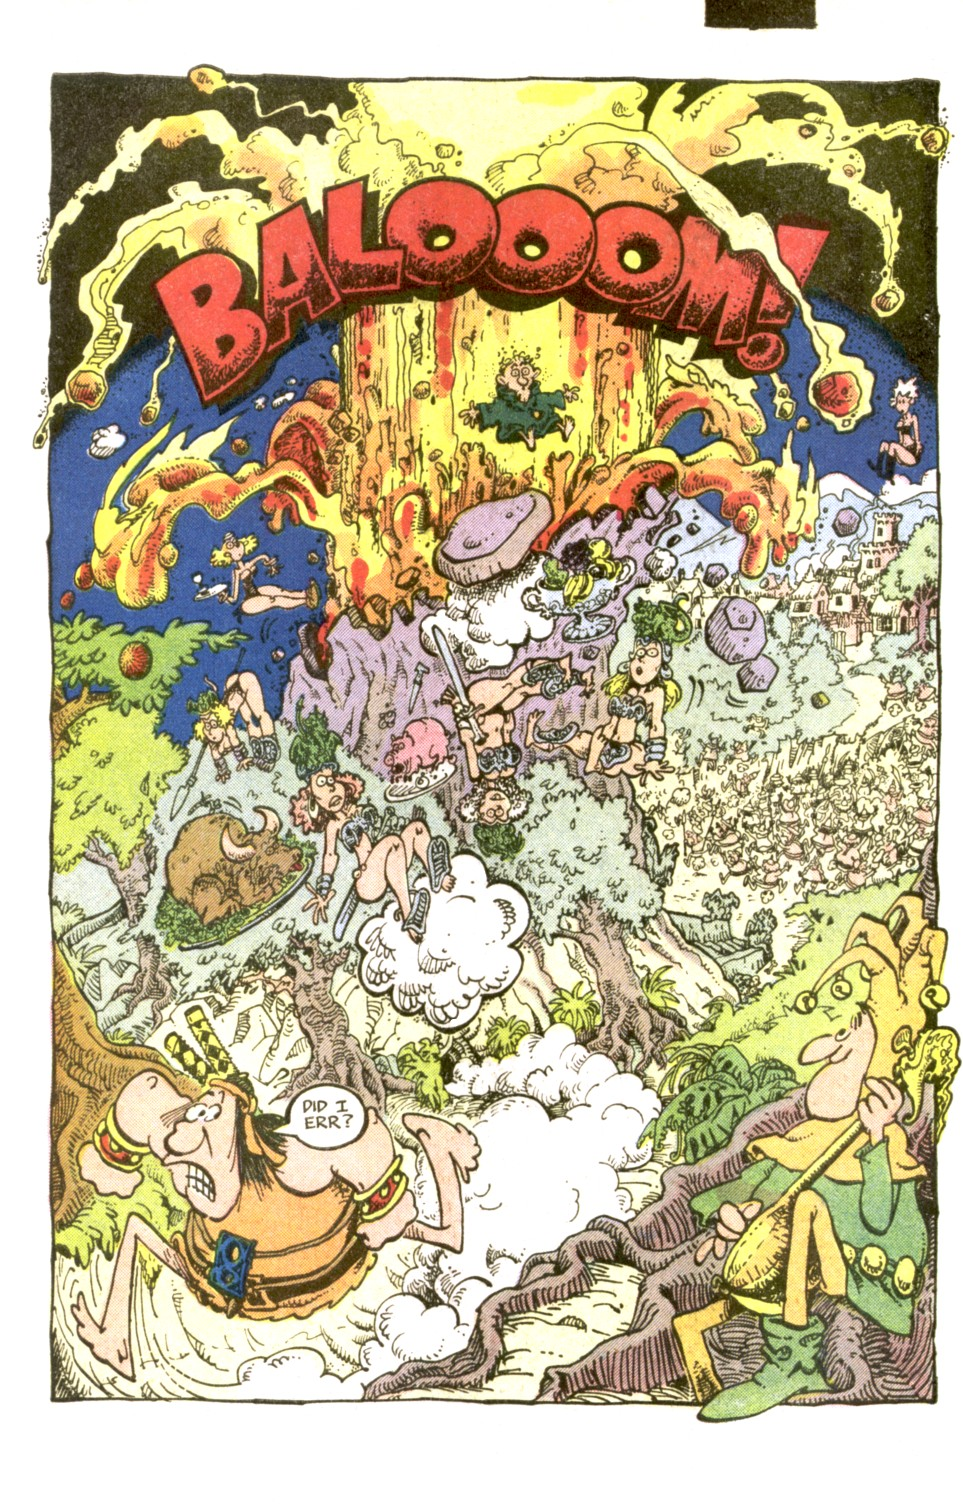 Read online Sergio Aragonés Groo the Wanderer comic -  Issue #2 - 21